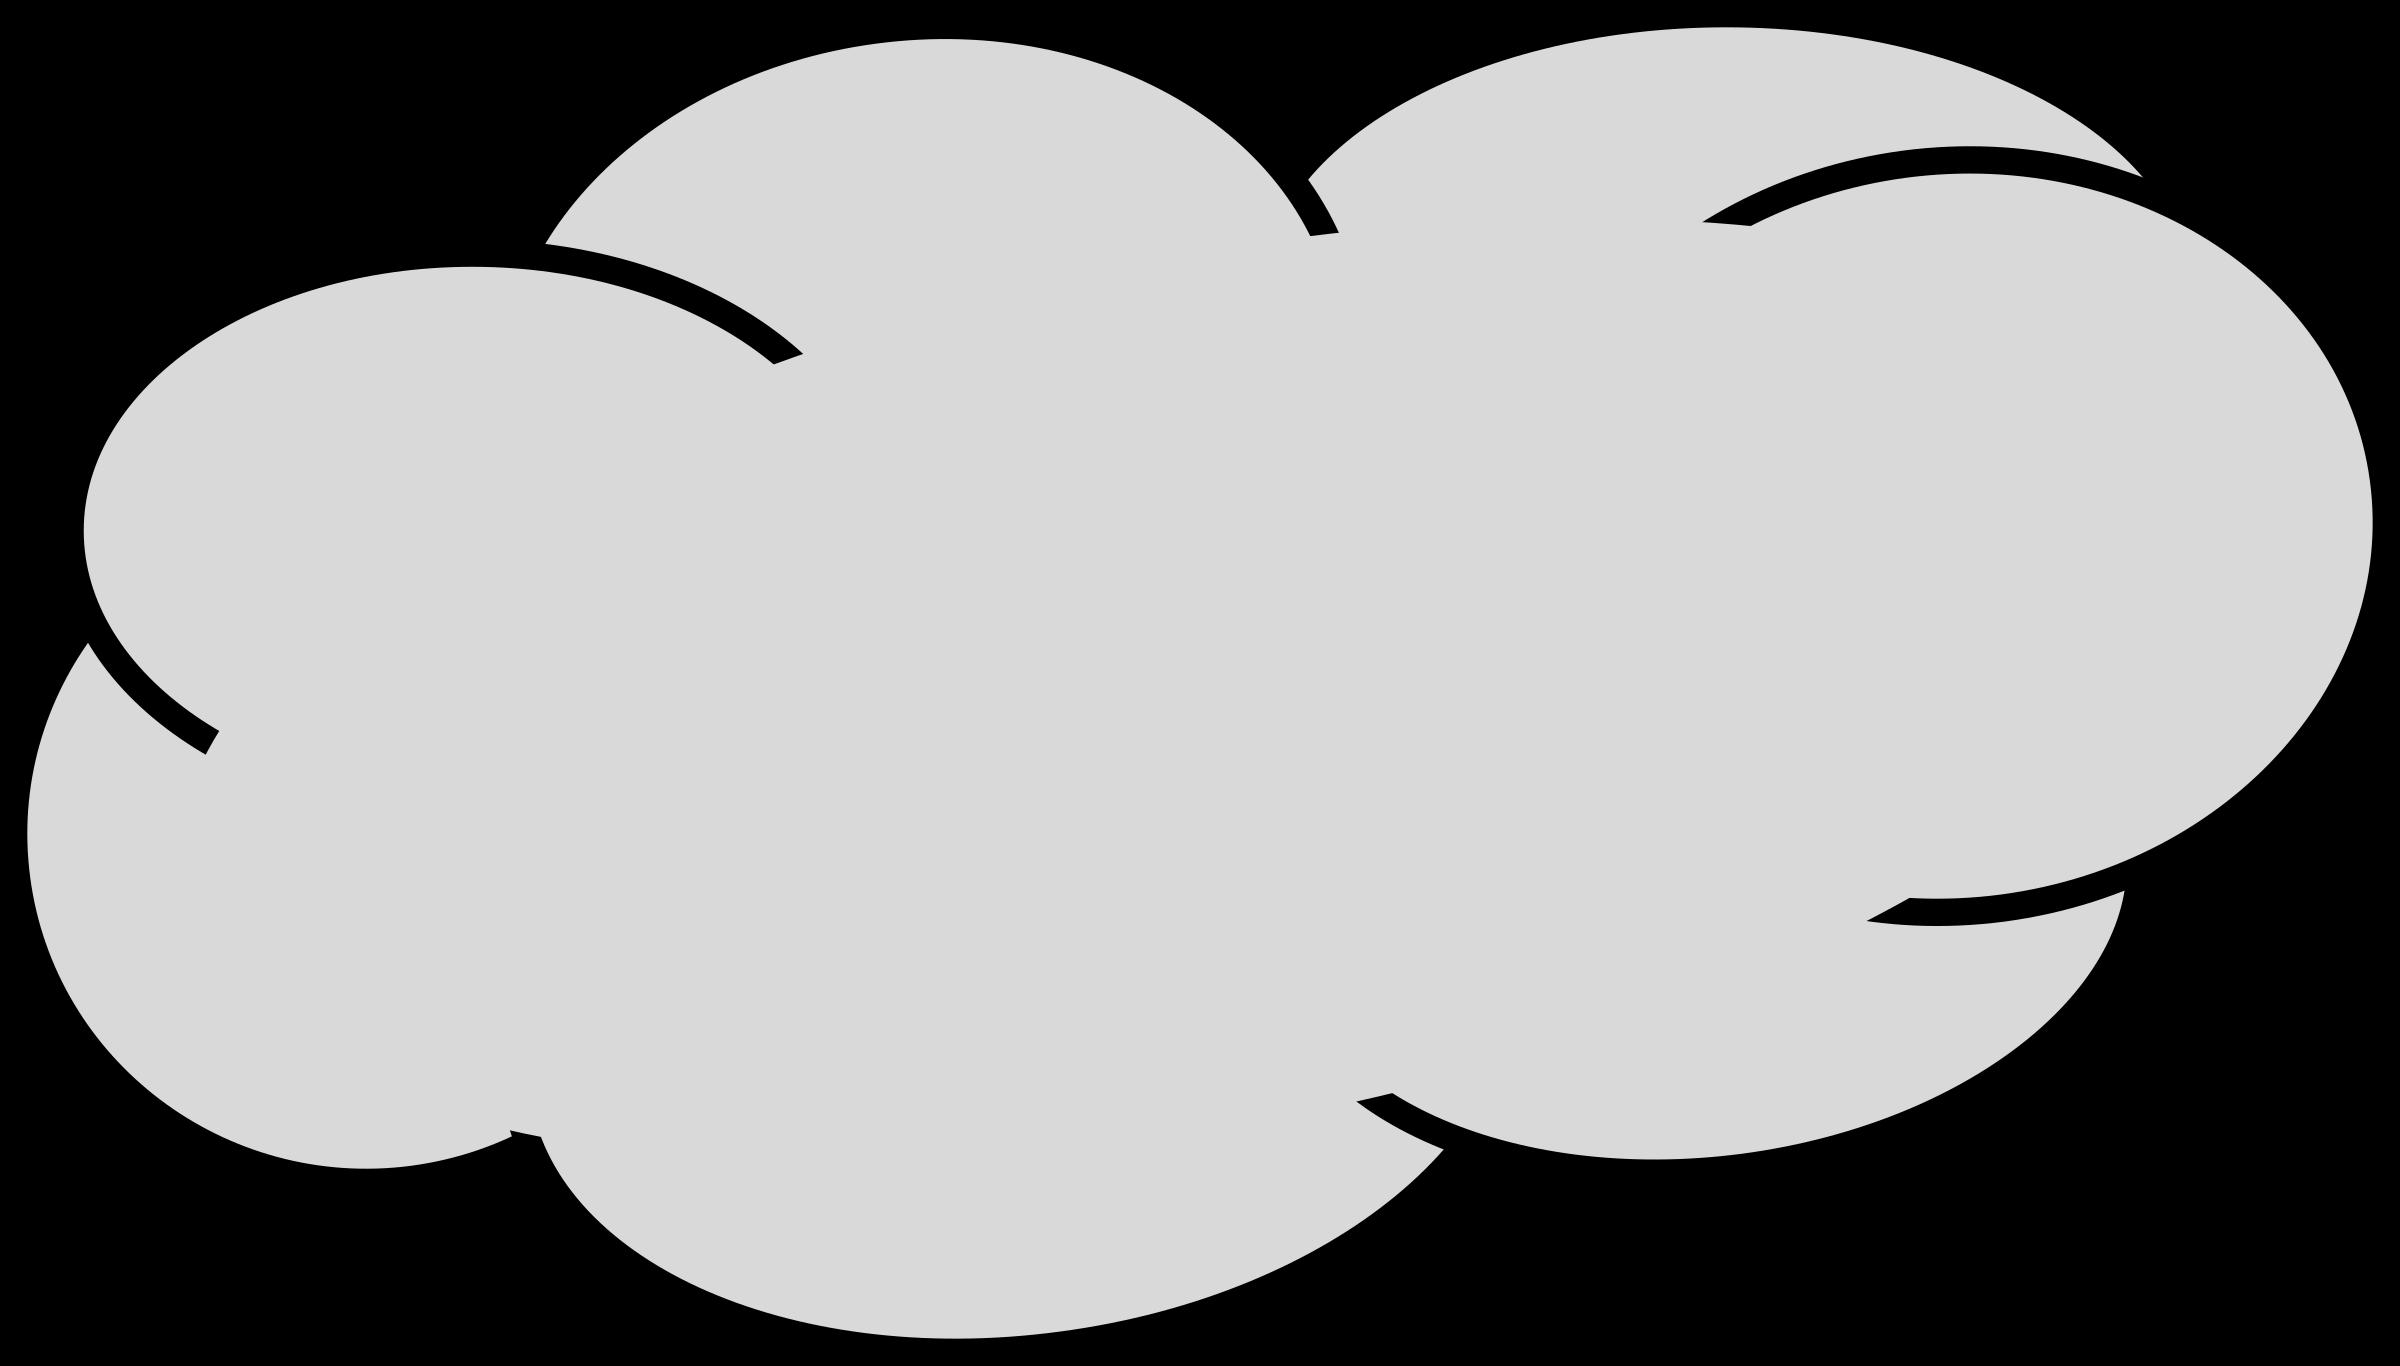 Cloudy clipart lightning cloud. Grey big image png